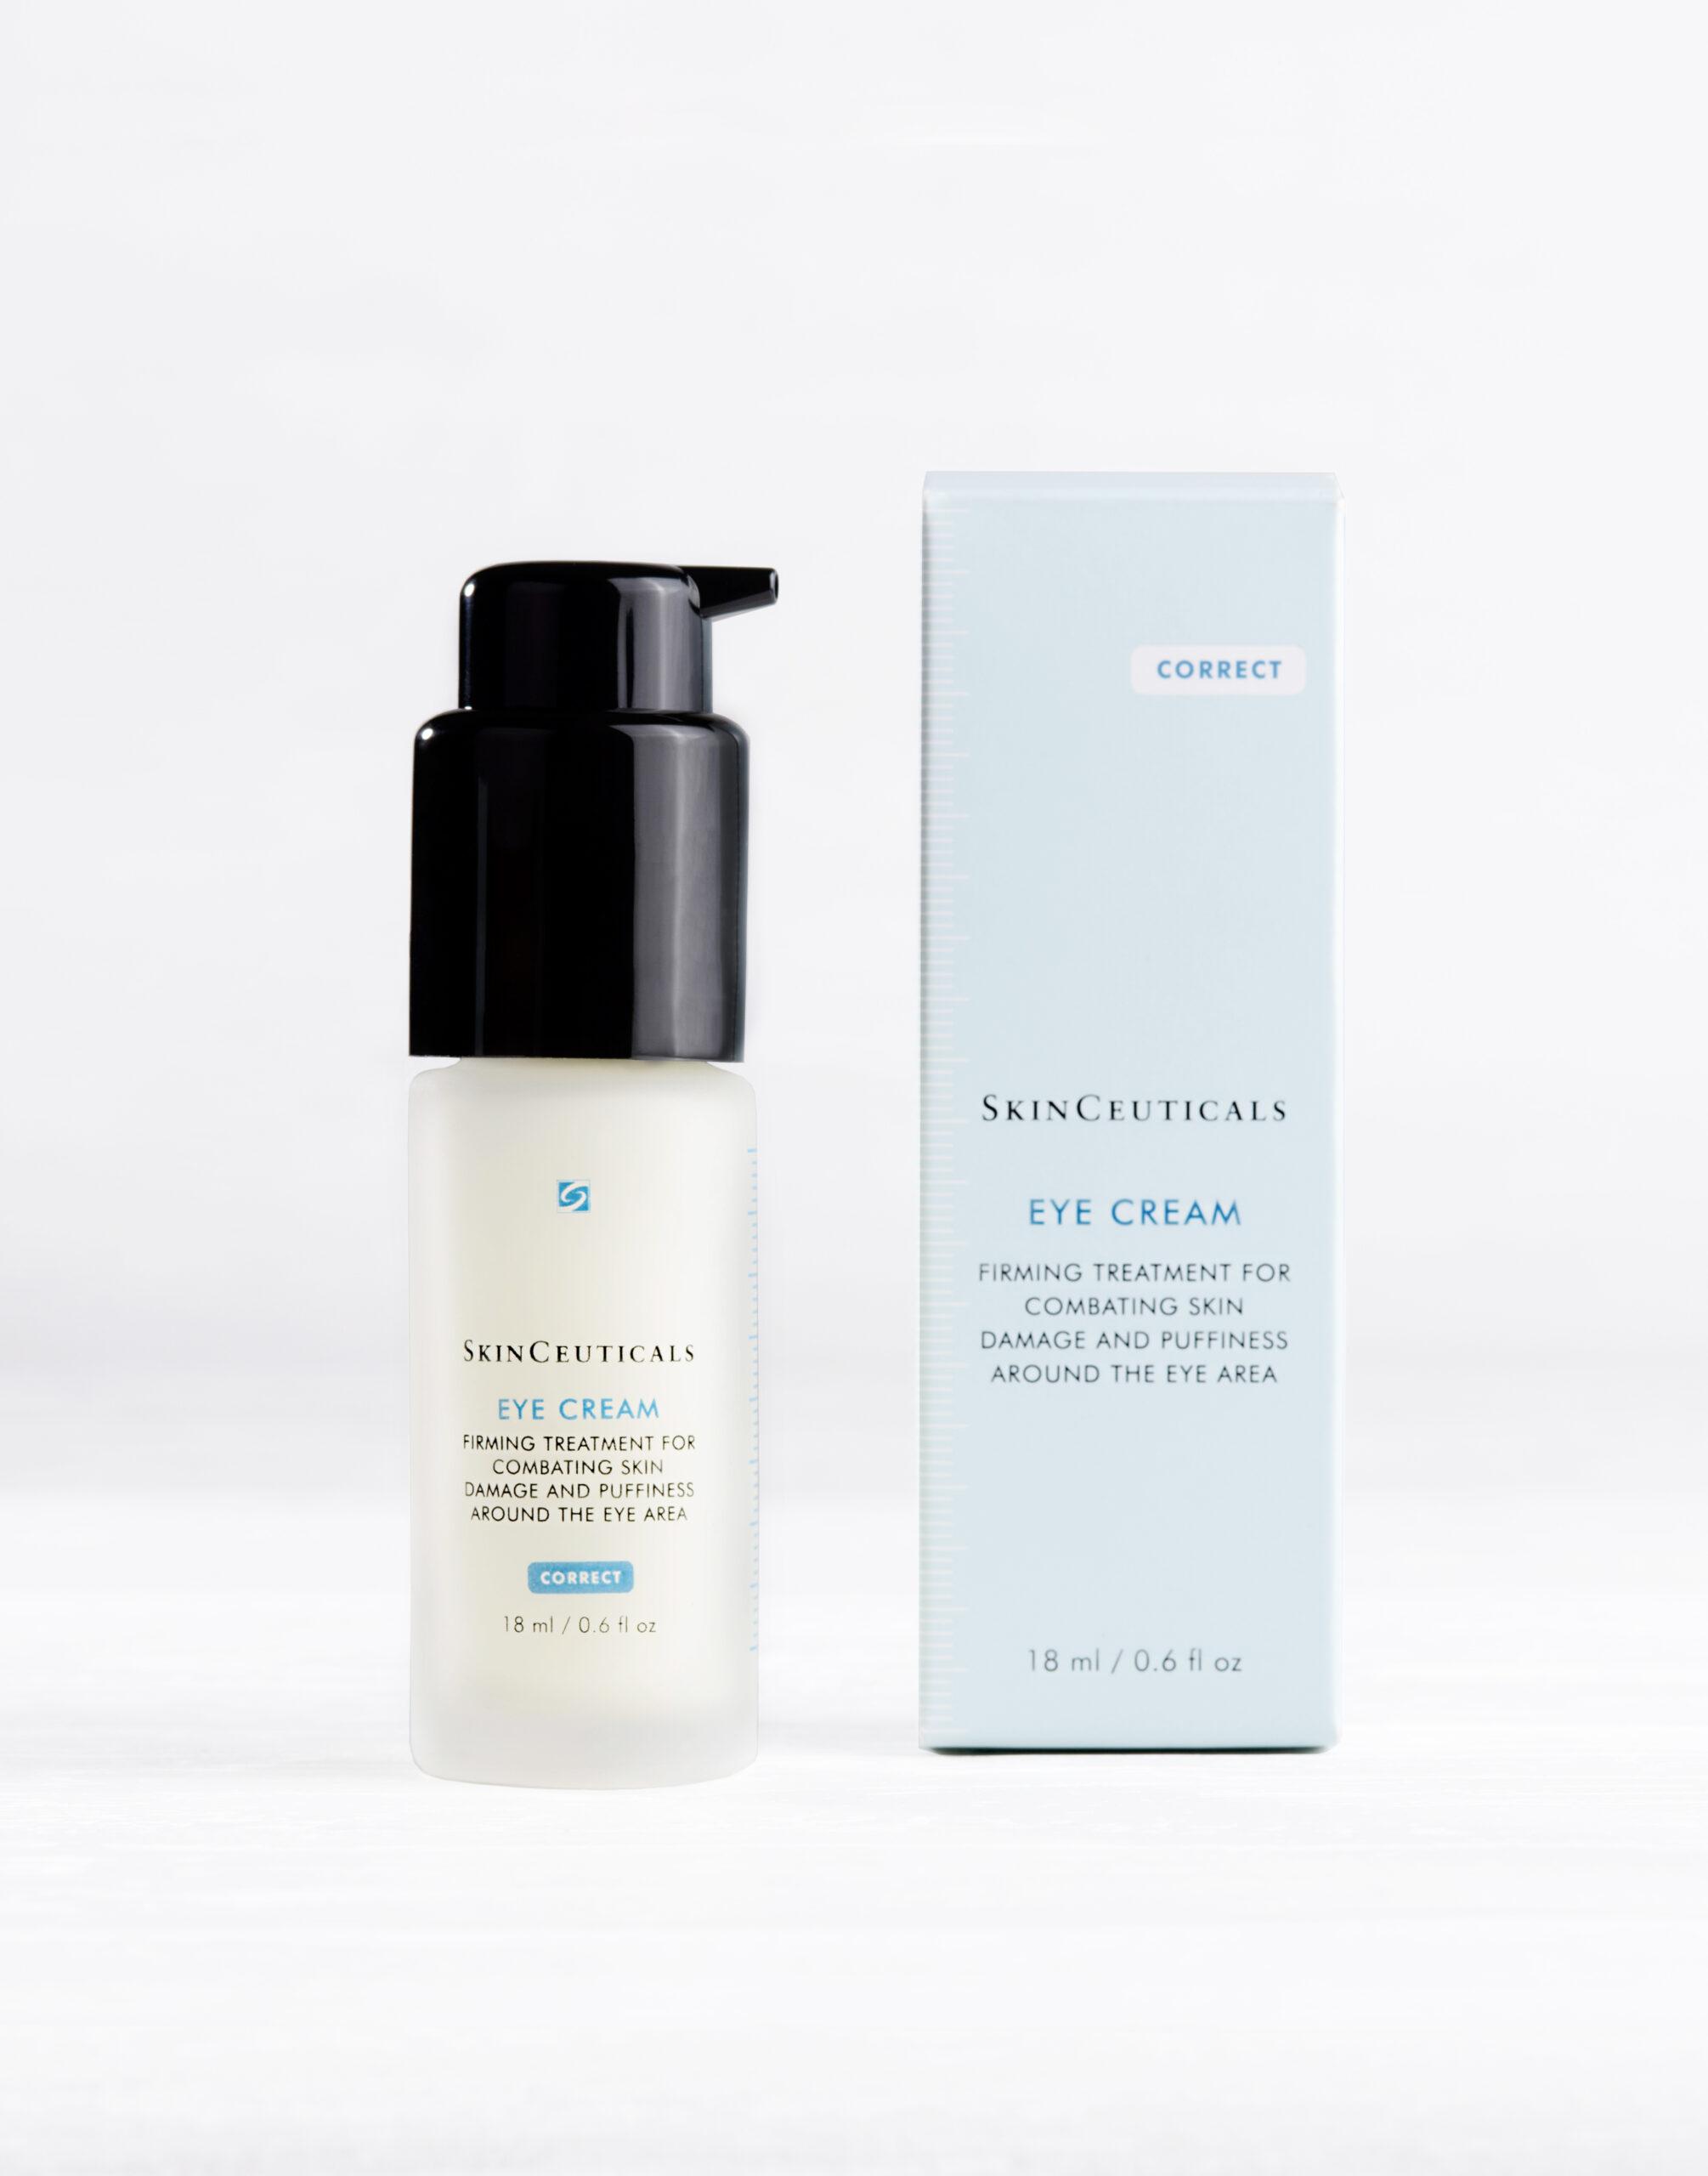 Skinceuticals Eye Cream for Wrinkles at SKIN Las Vegas Med Spa